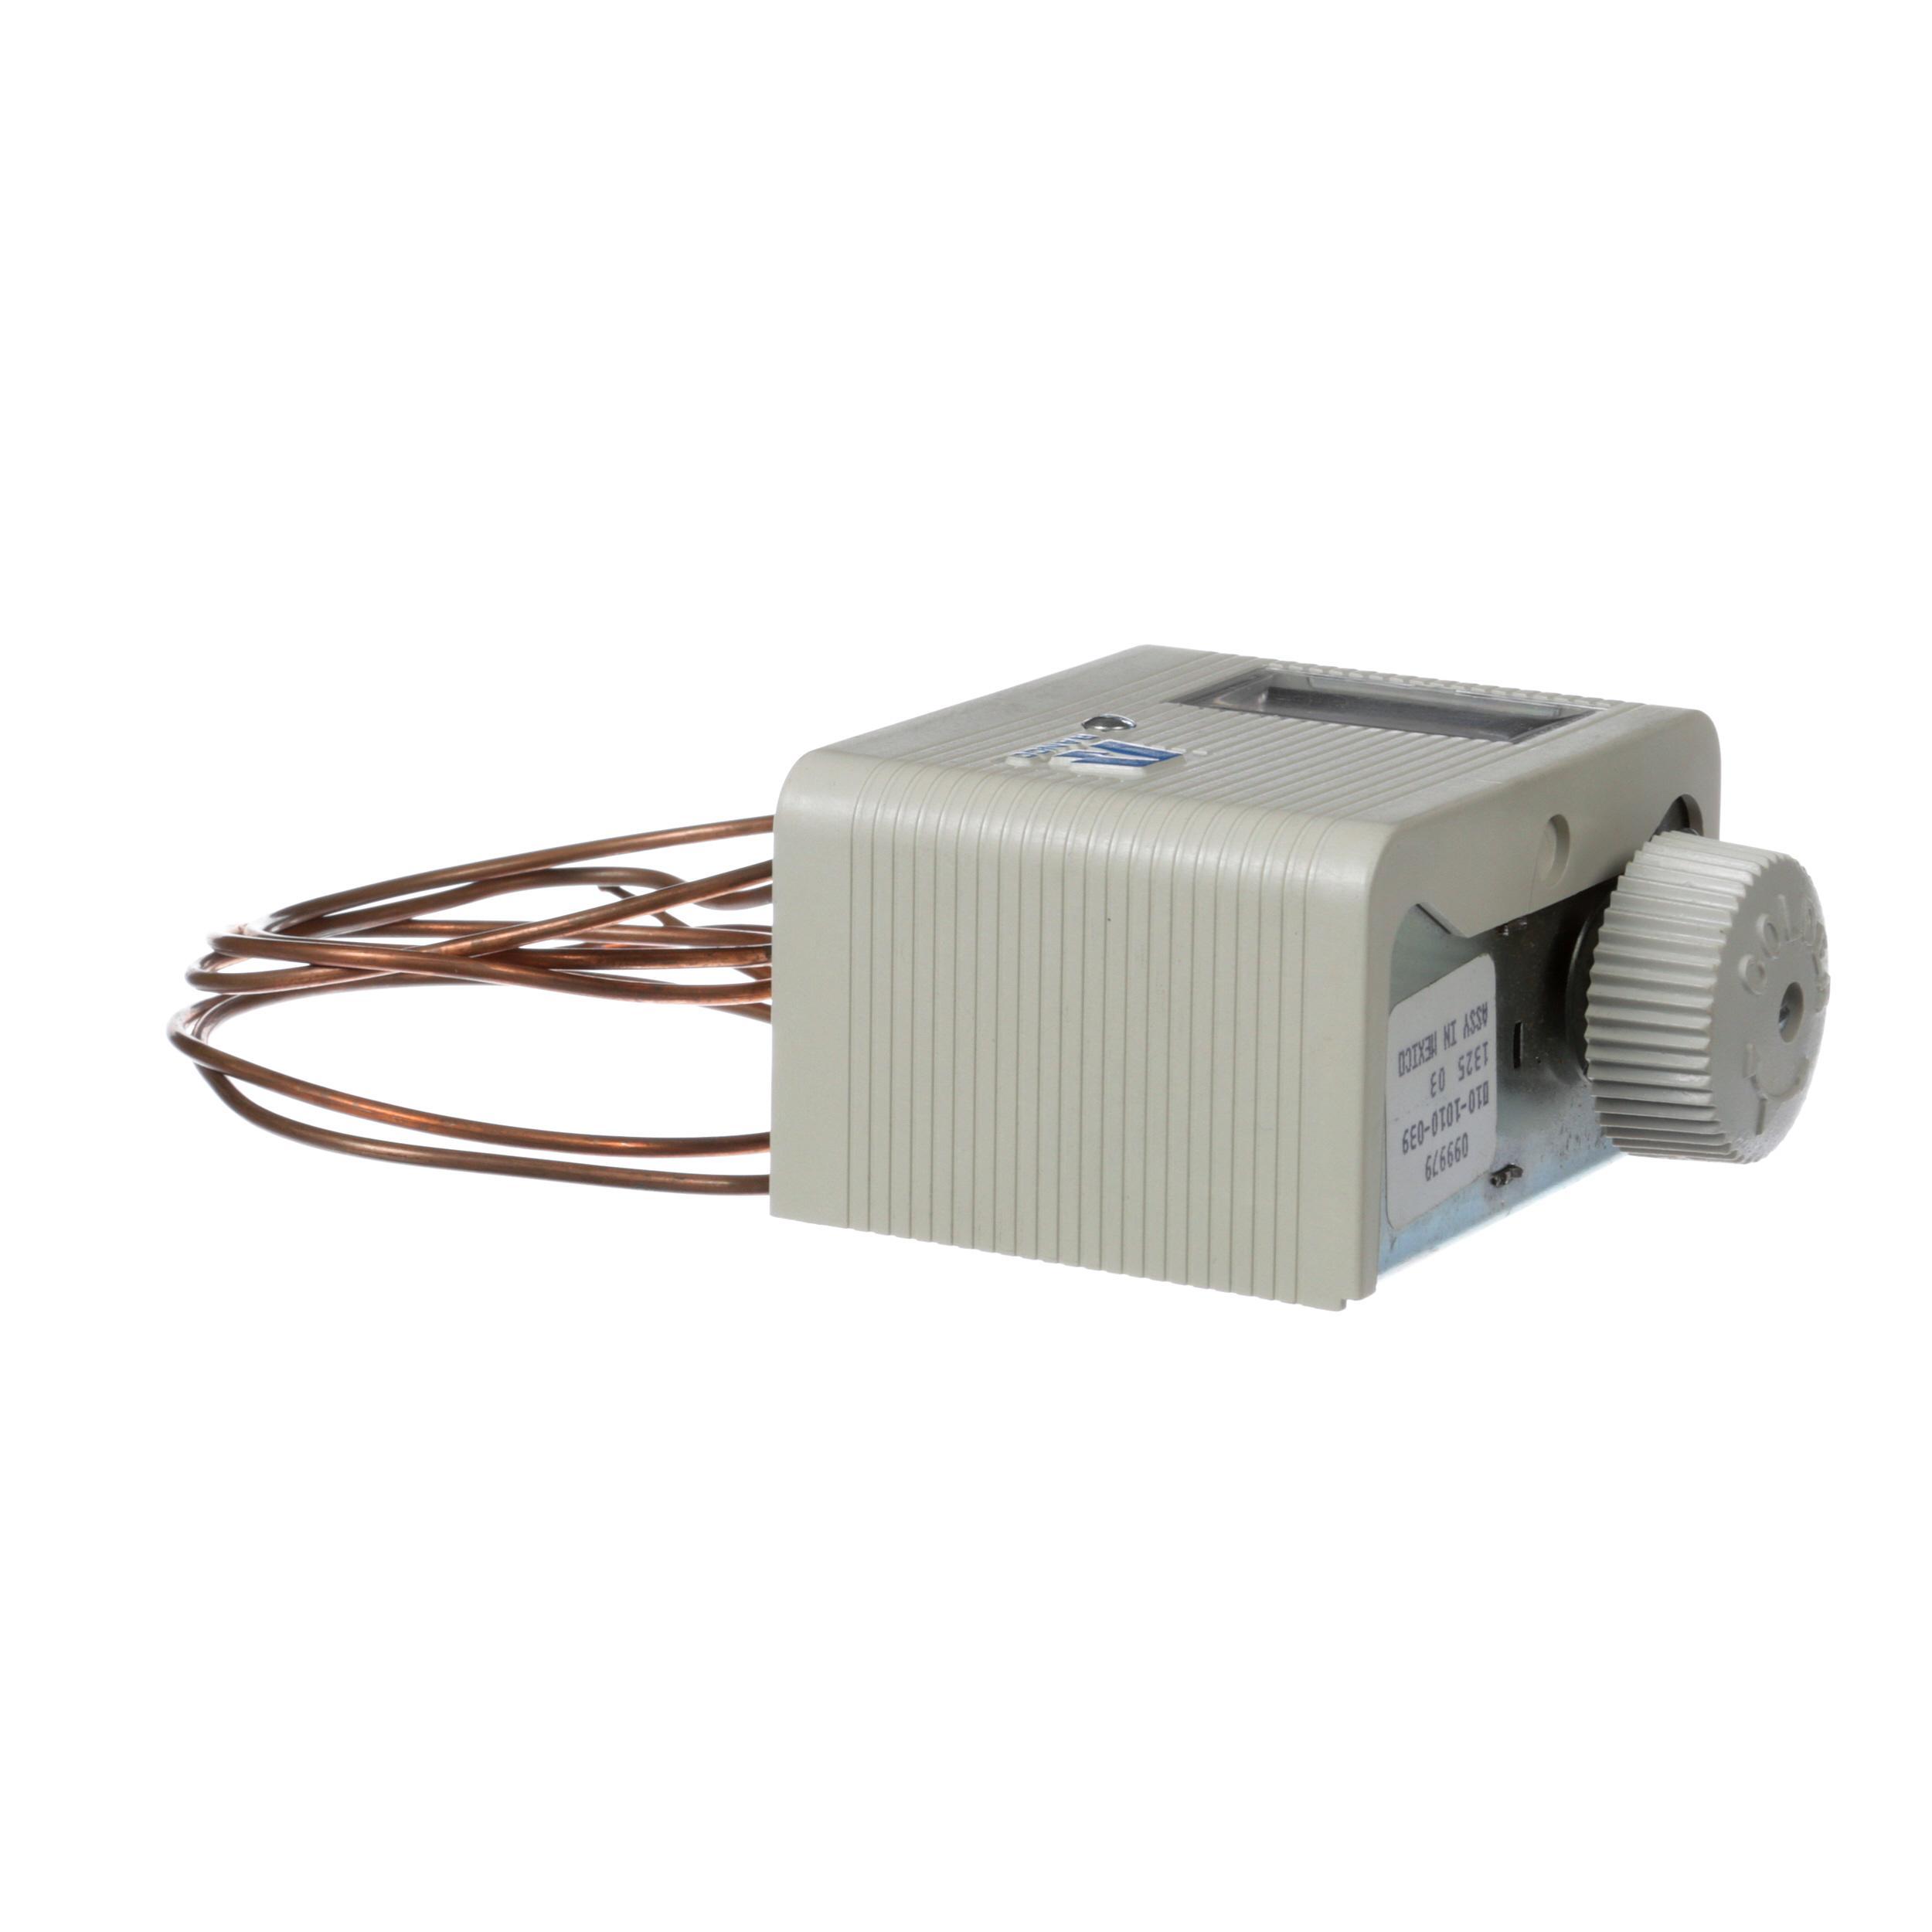 Nor Lake Temp Control Ranco 010 1010 39 Part 099979 The Digital Temperature Controller